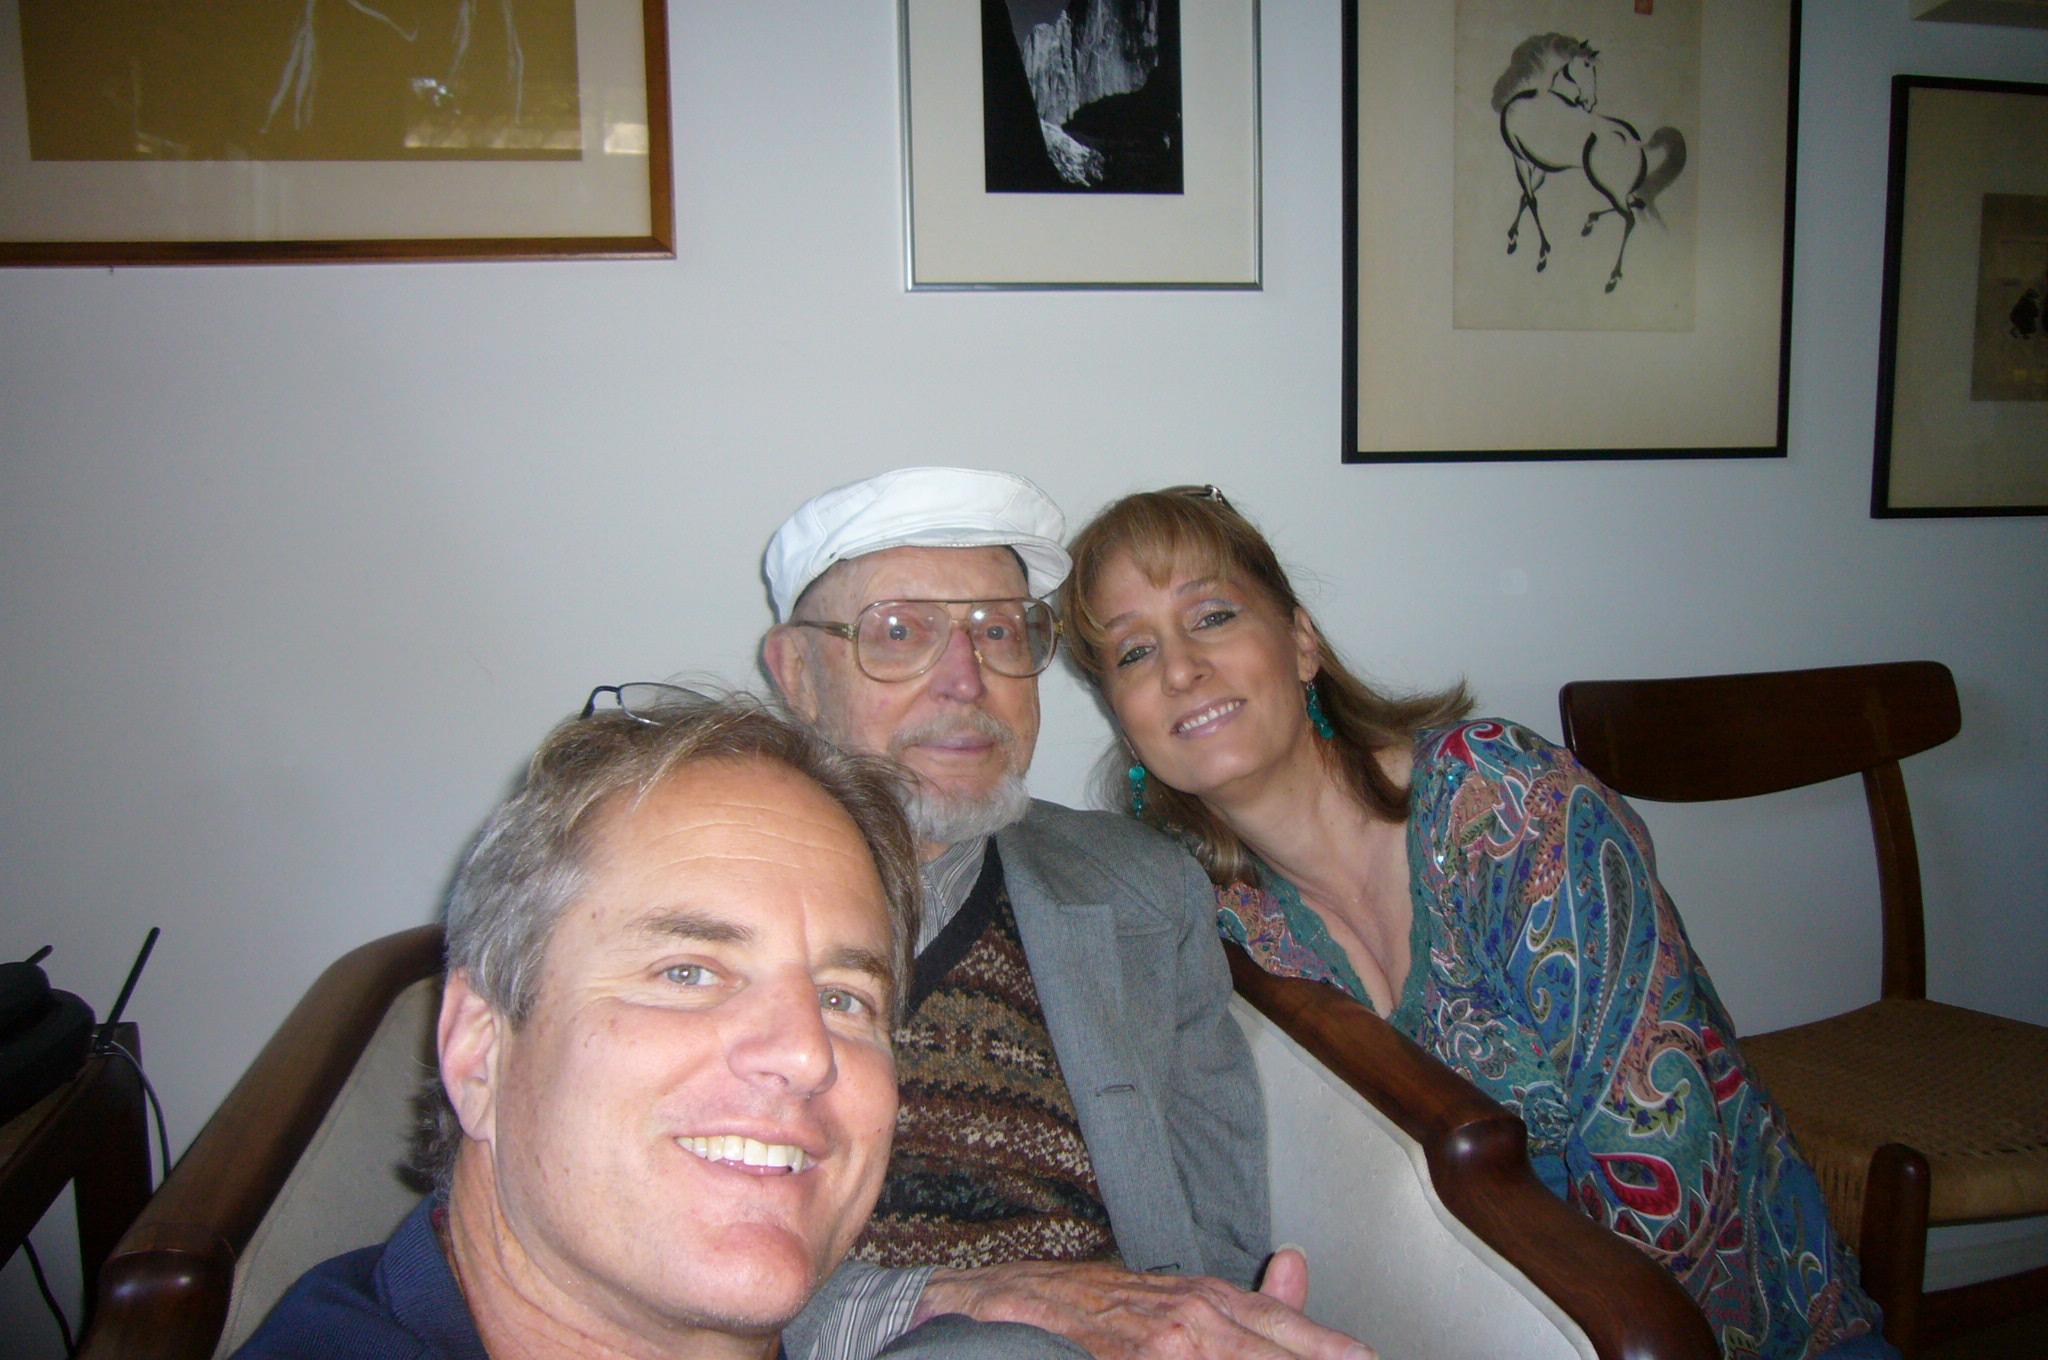 Wally Boag,Laurence Boag, & Carlene